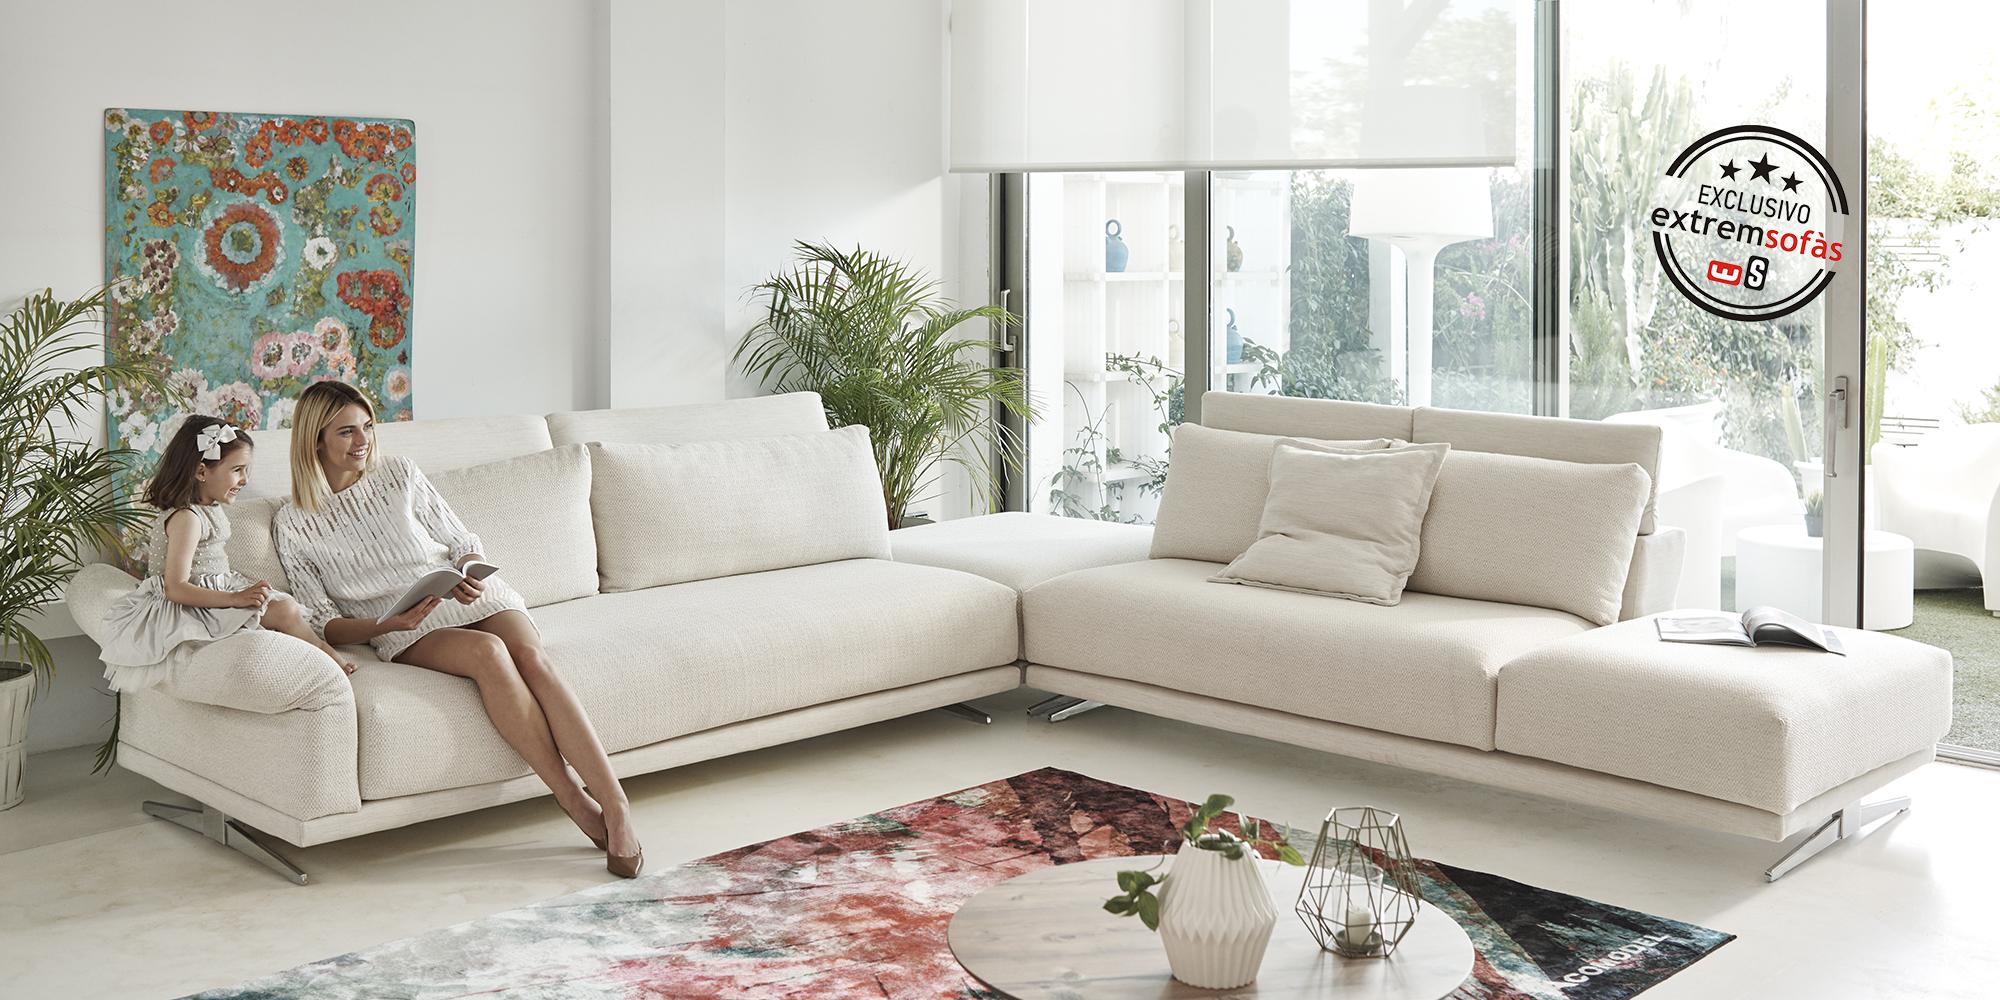 Extremsofas marcas cat logo gamamobel venta de sof s for Catalogos de sofas y precios